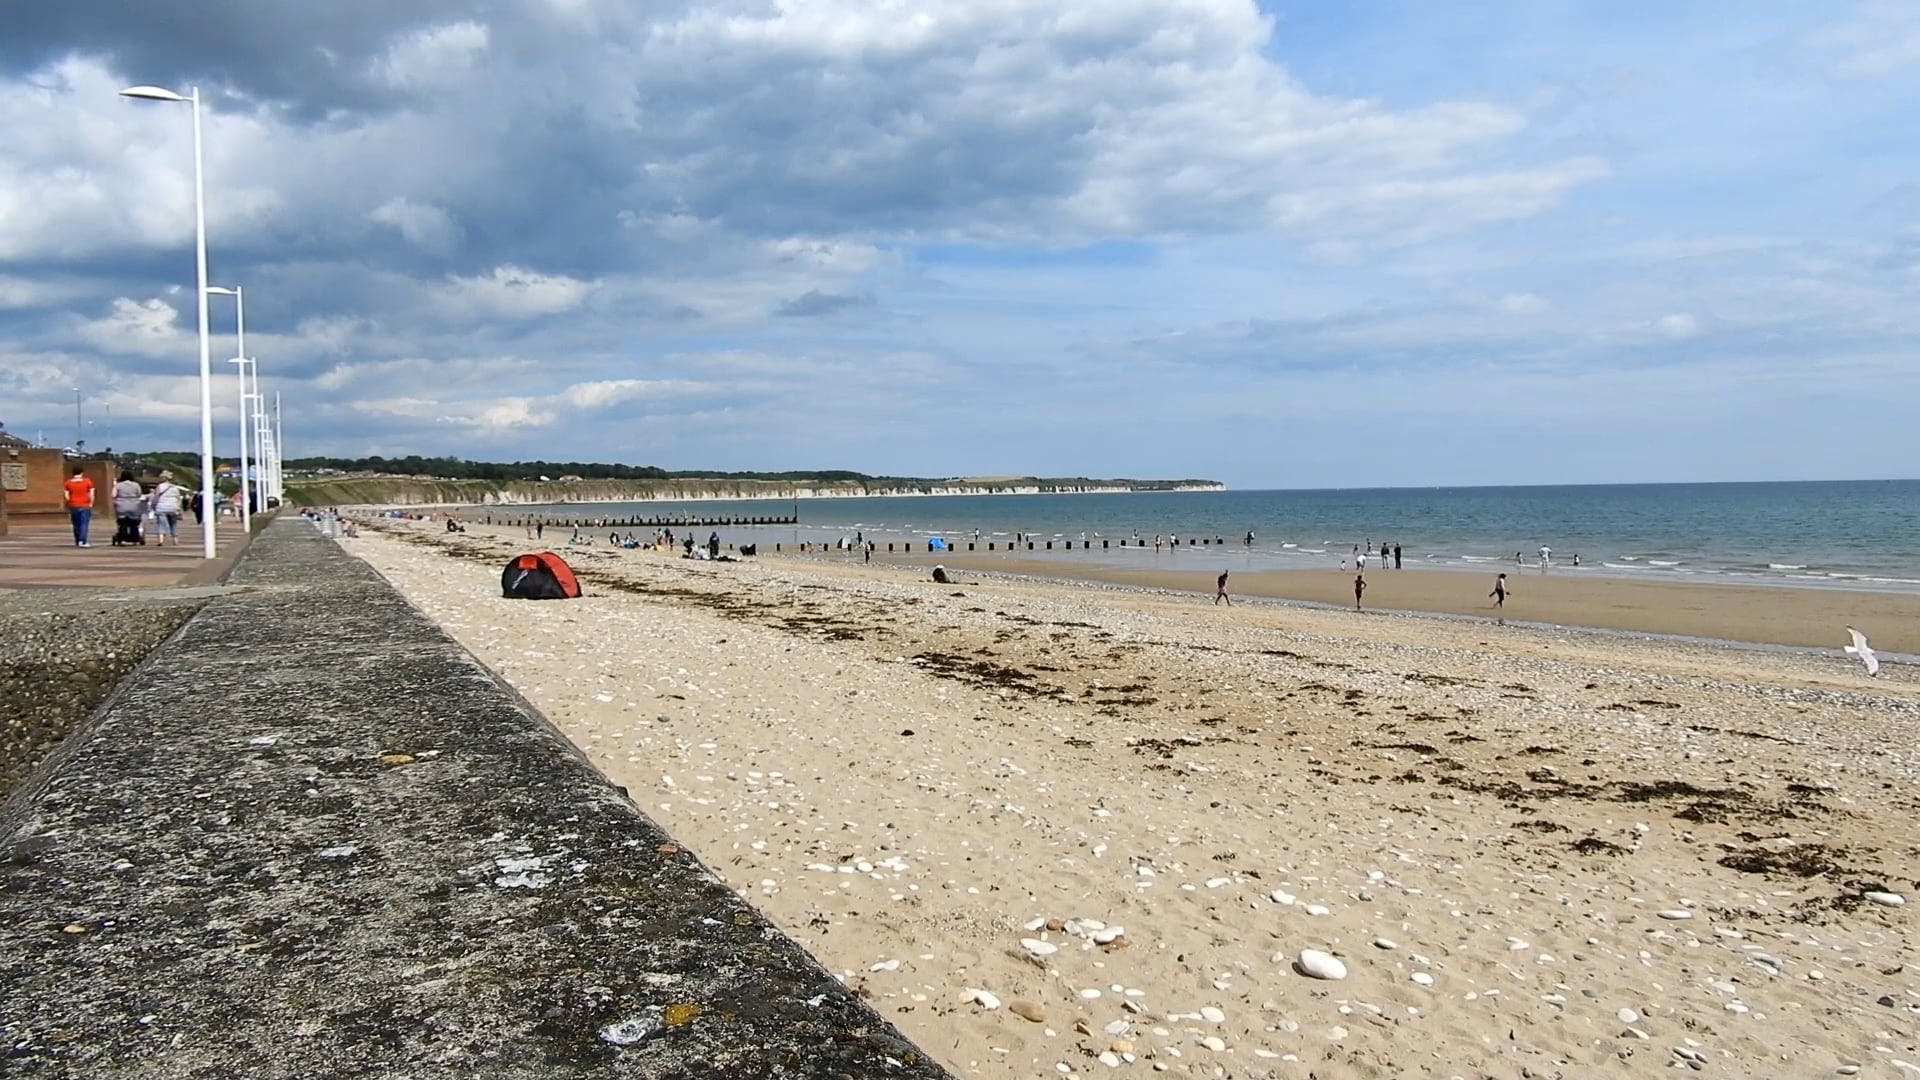 People Enjoying The Beach At Summer